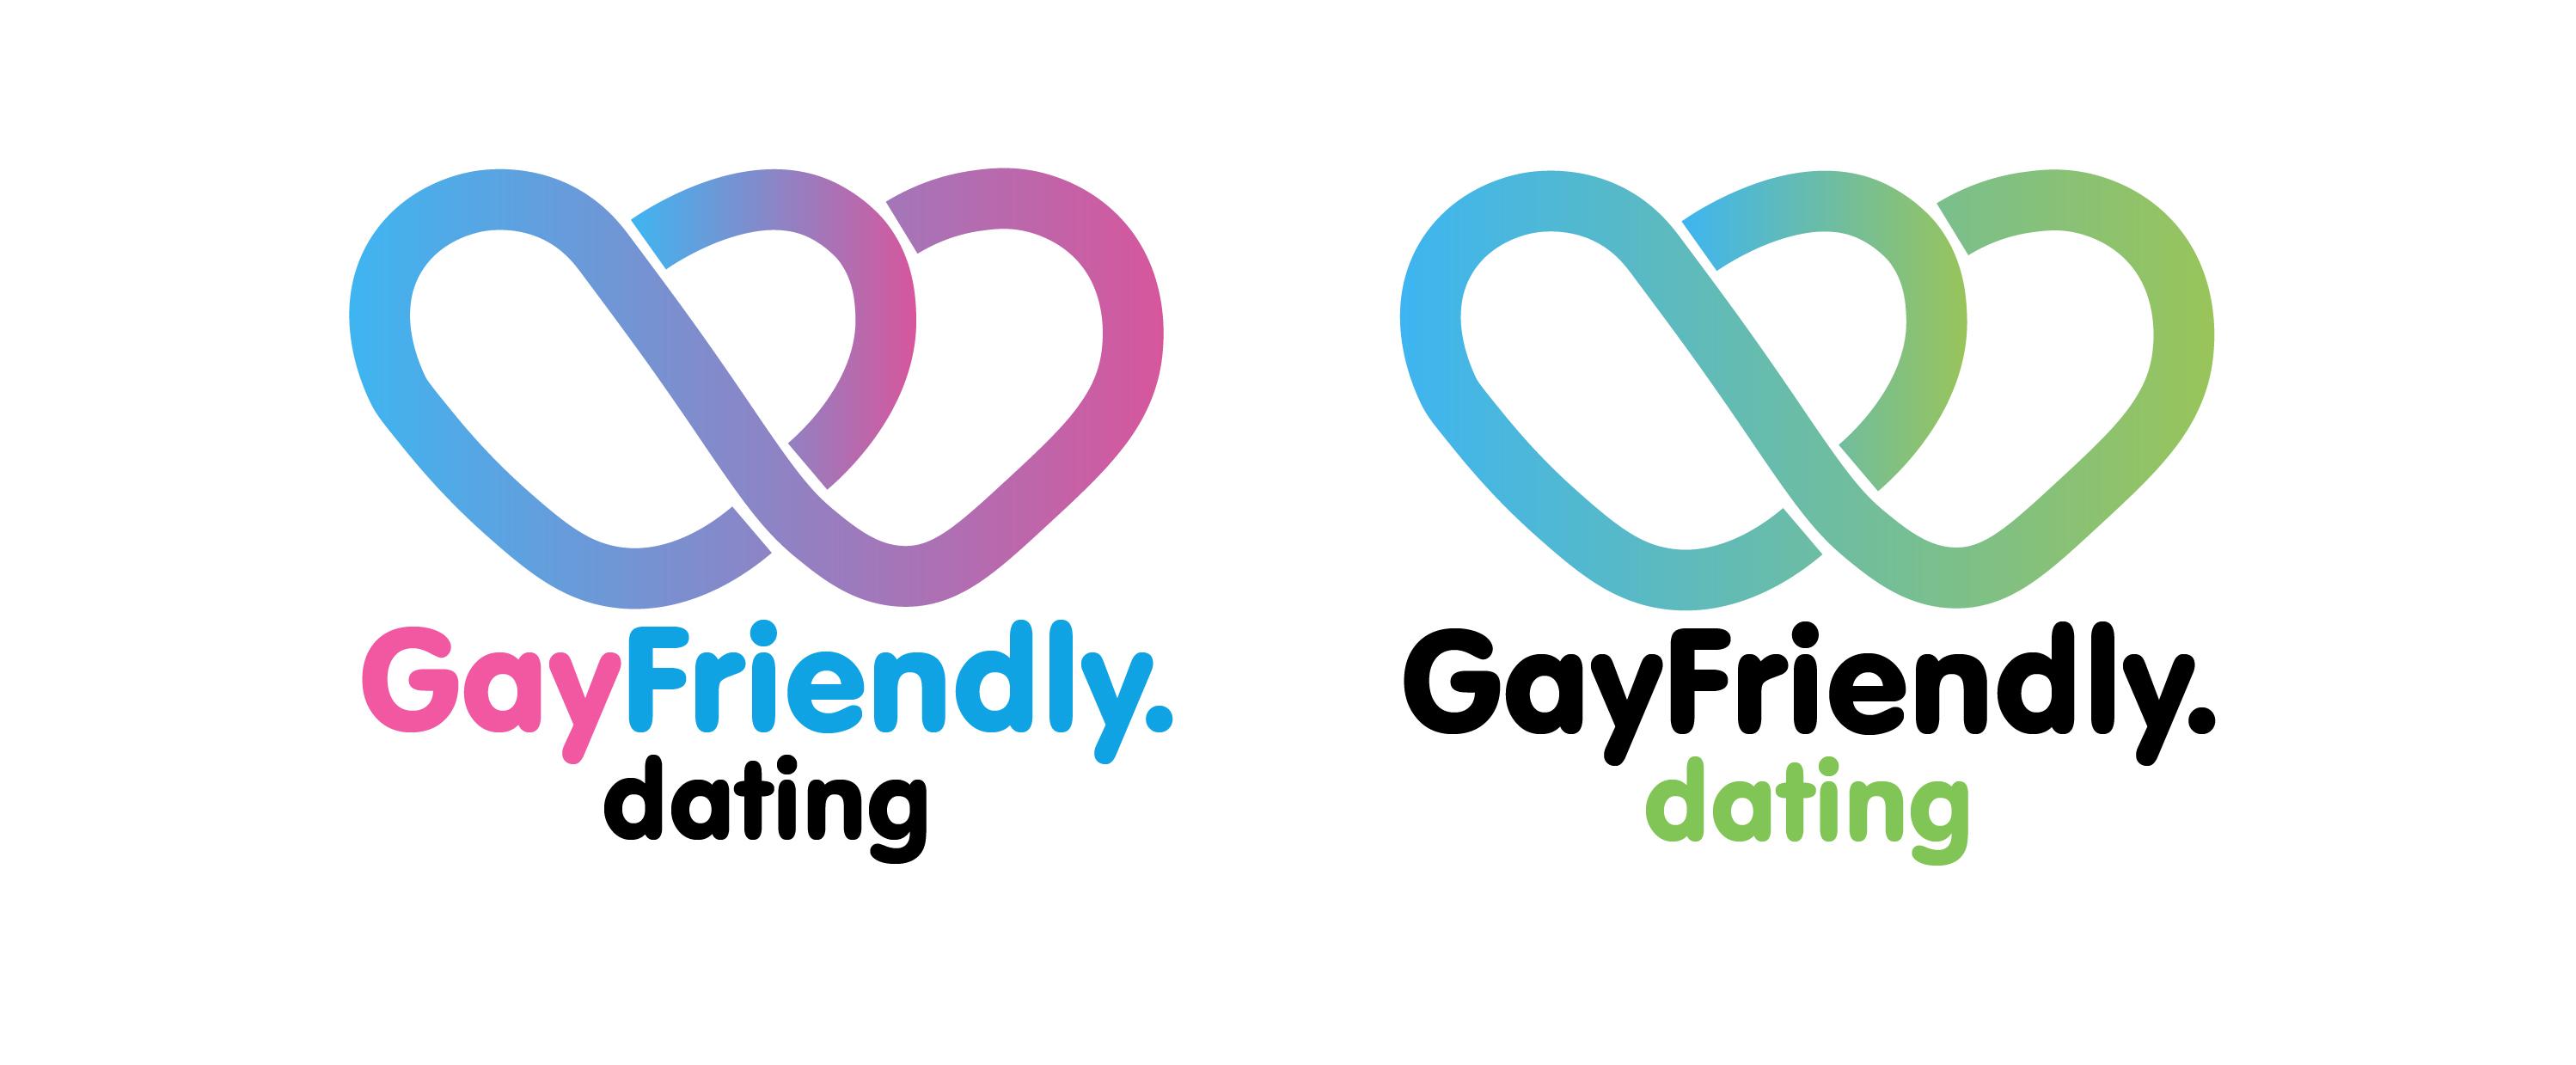 Разработать логотип для англоязычн. сайта знакомств для геев фото f_7885b476bf7ce2b9.jpg